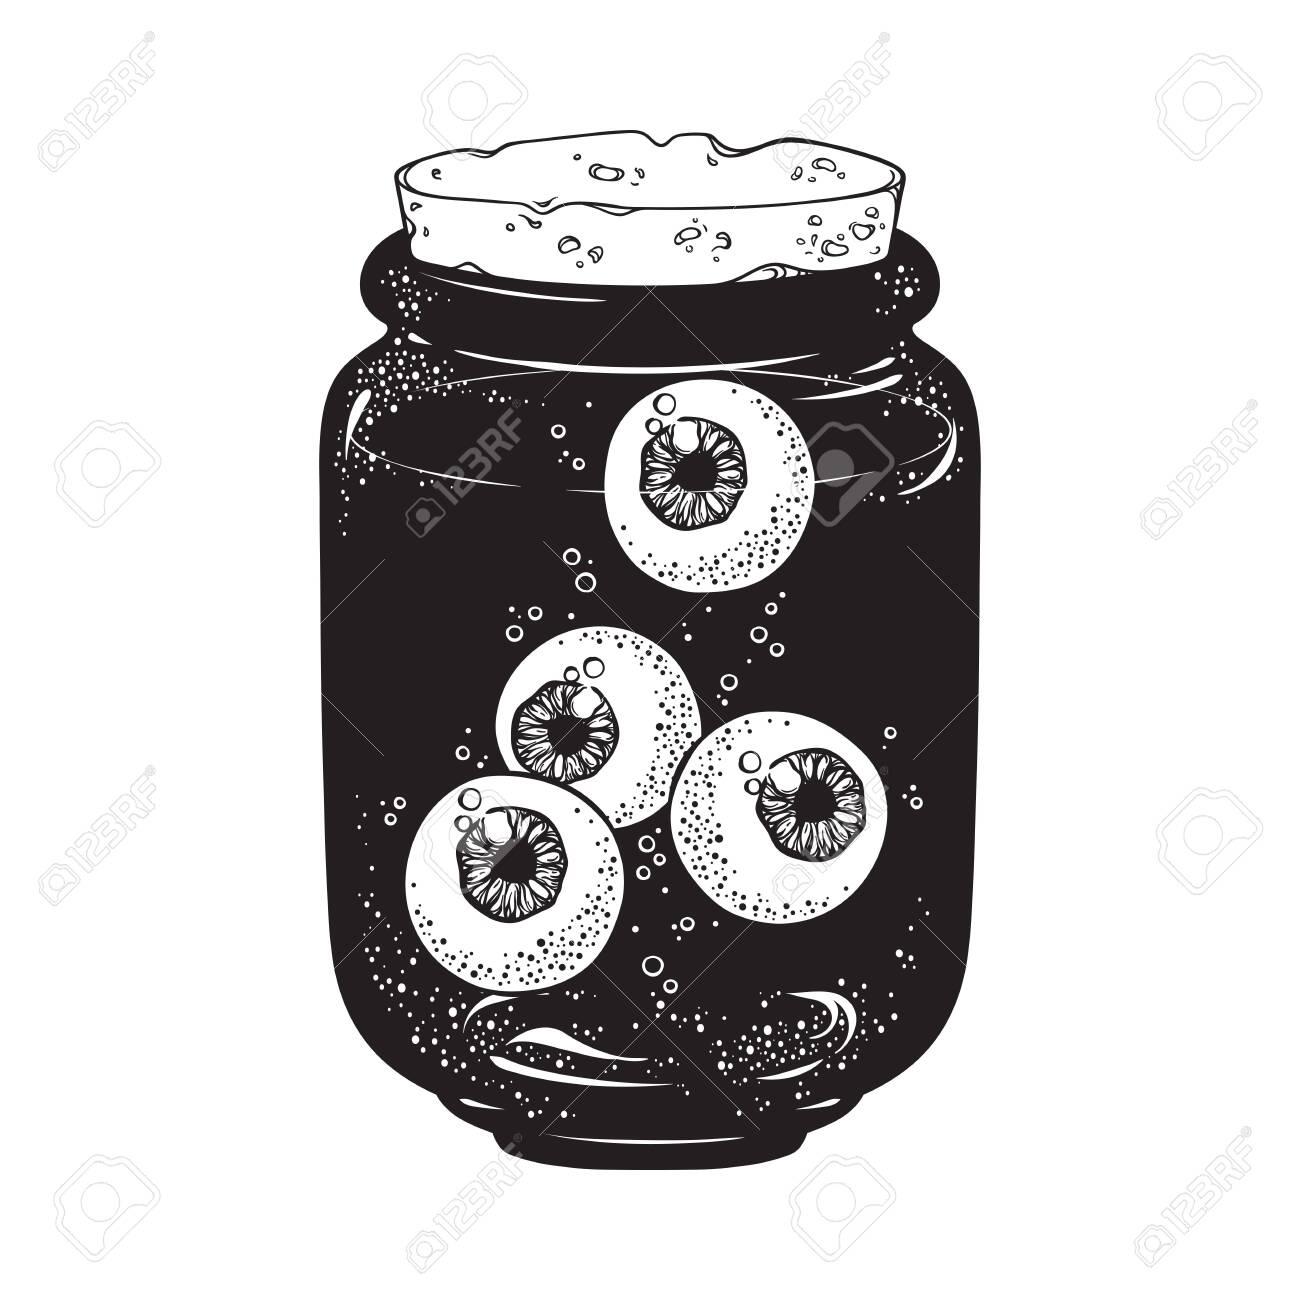 Human eyeballs in glass jar isolated. Sticker, print or blackwork tattoo hand drawn vector illustration - 135608607